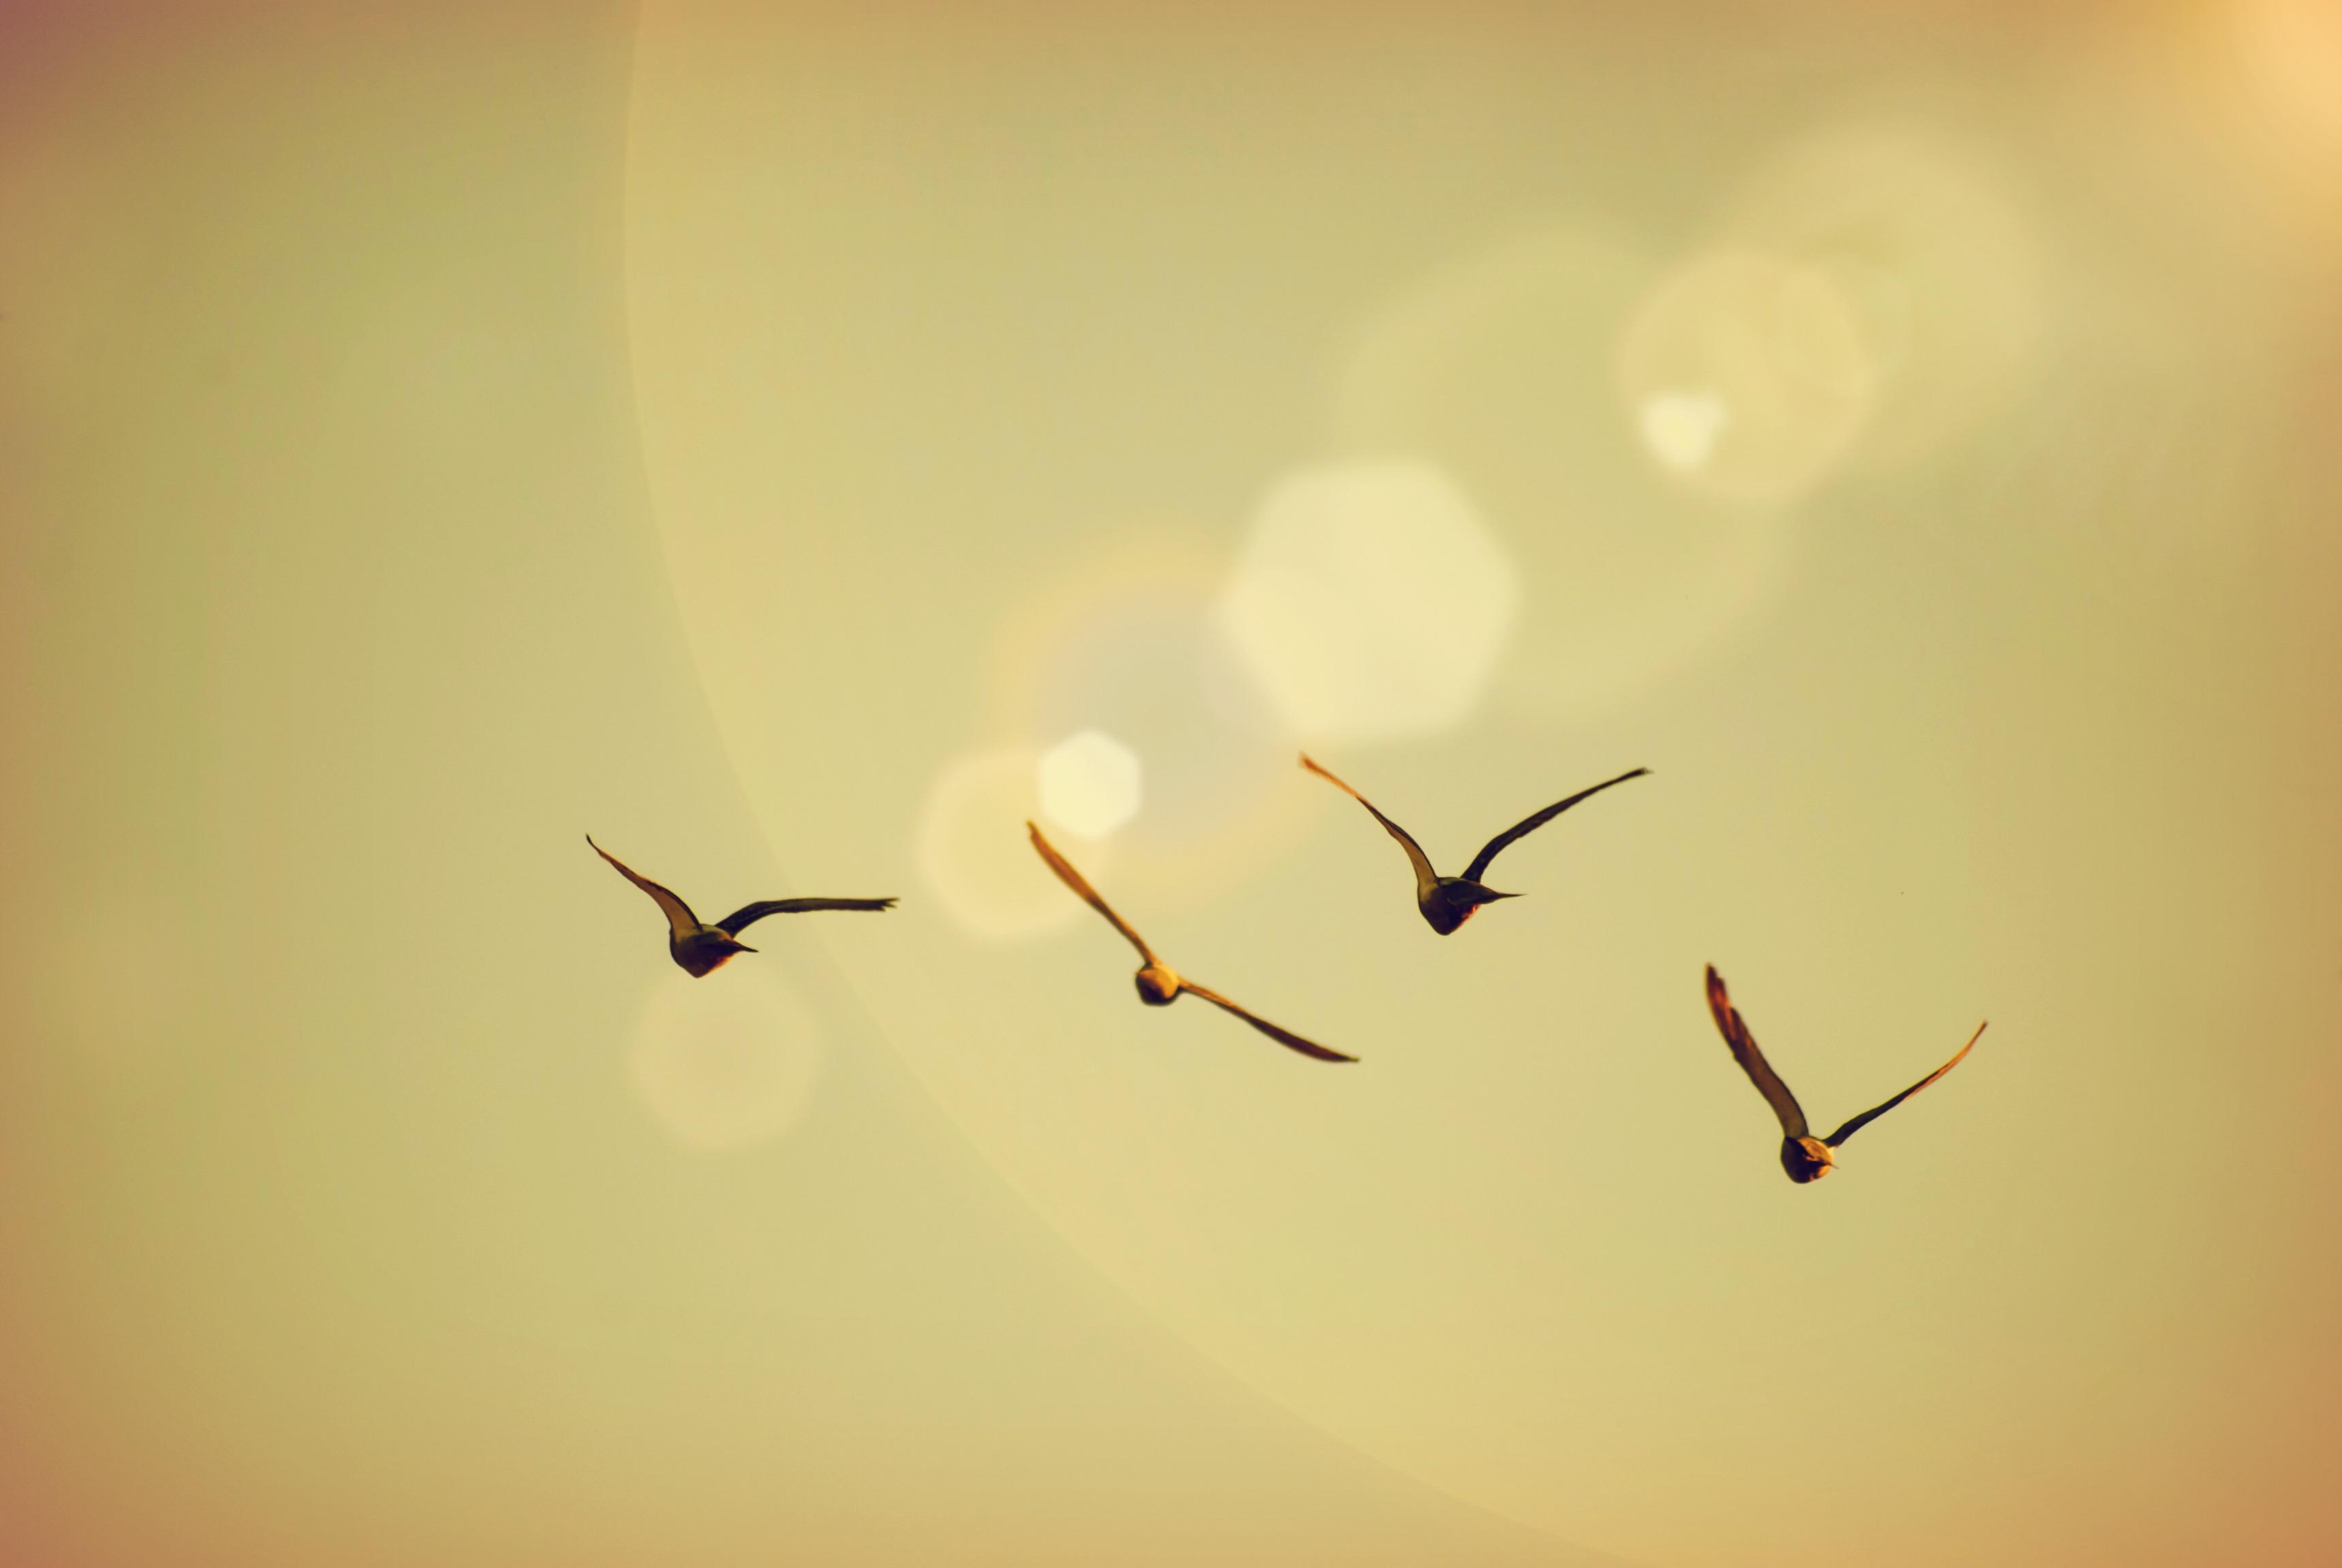 Wallpaper : animals, sunset, love, sky, sunrise, calm, Sun, life